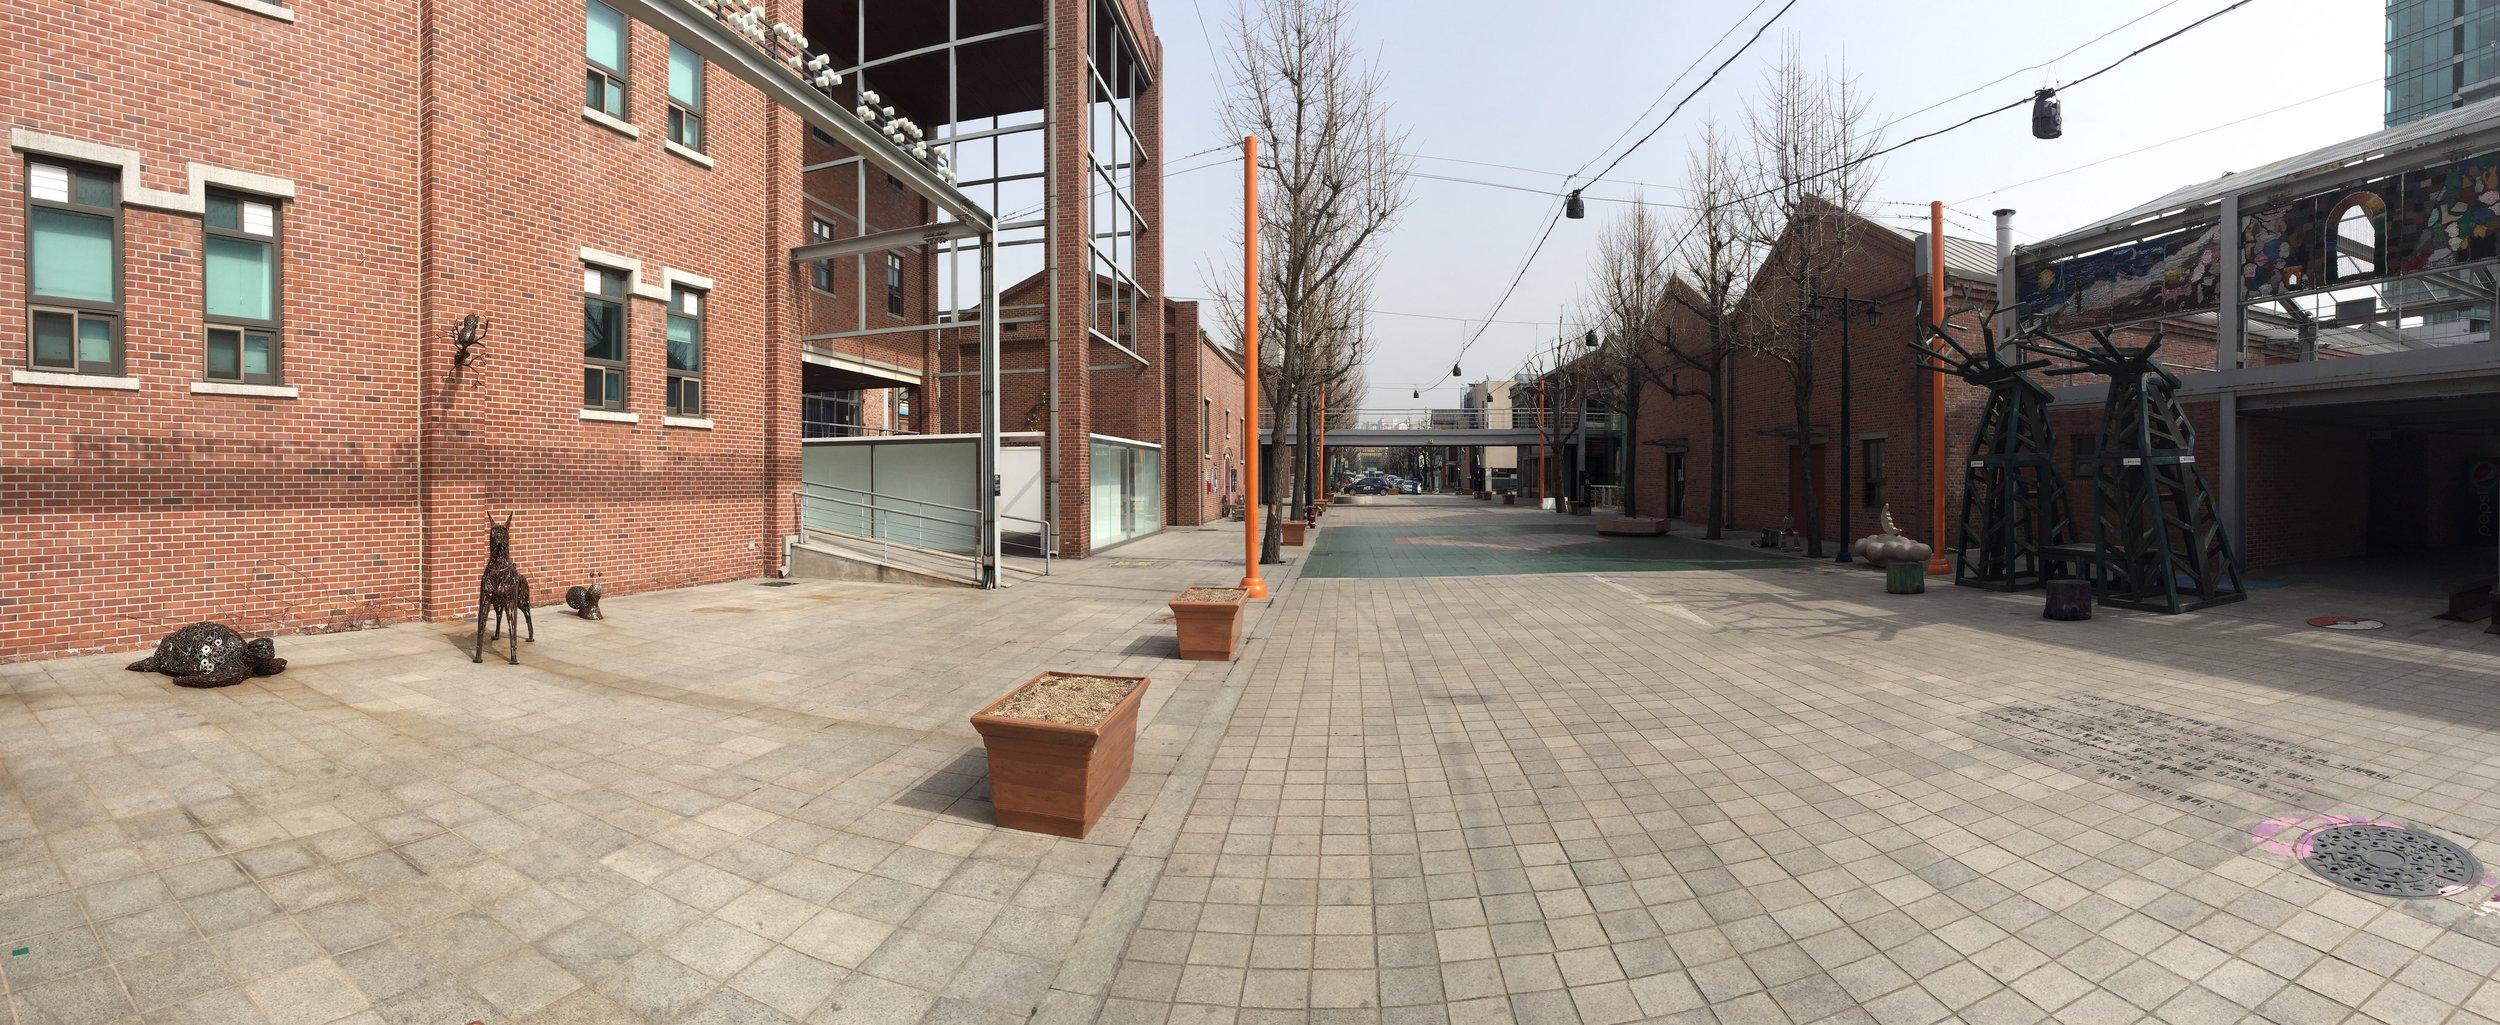 View down the Incheon Art Platform Street